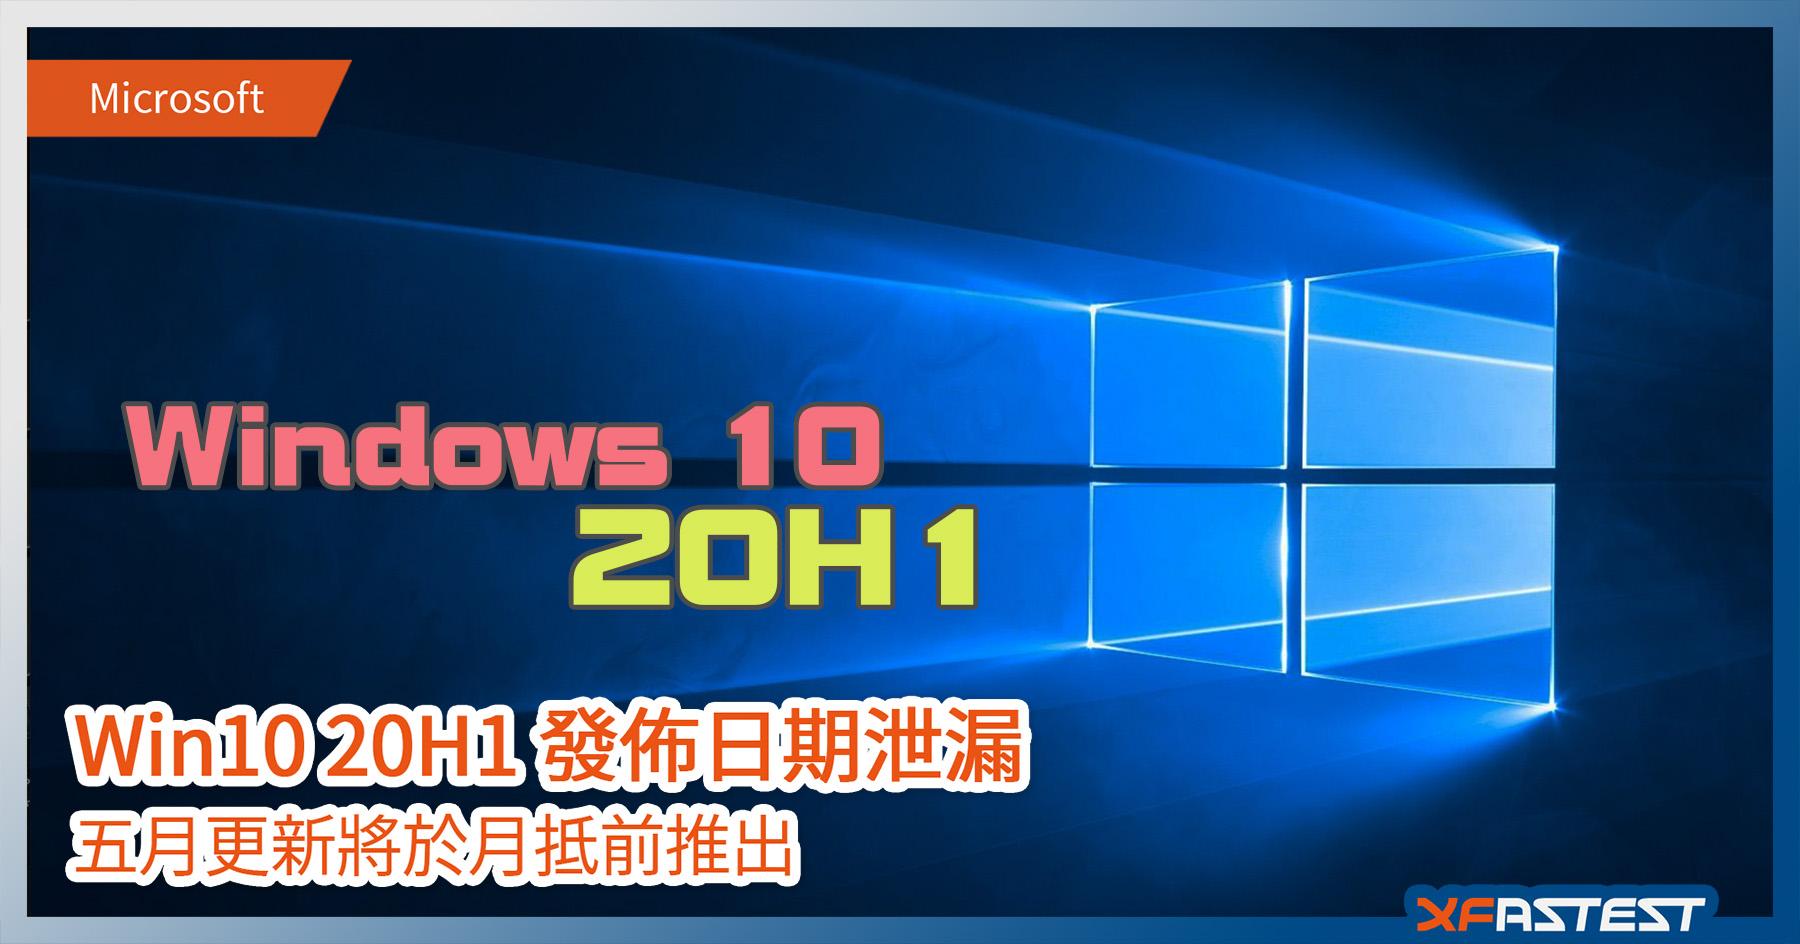 Microsoft 自曝釋出日期 - Win10 20H1 五月更新日期曝光 - XFastest Hong Kong